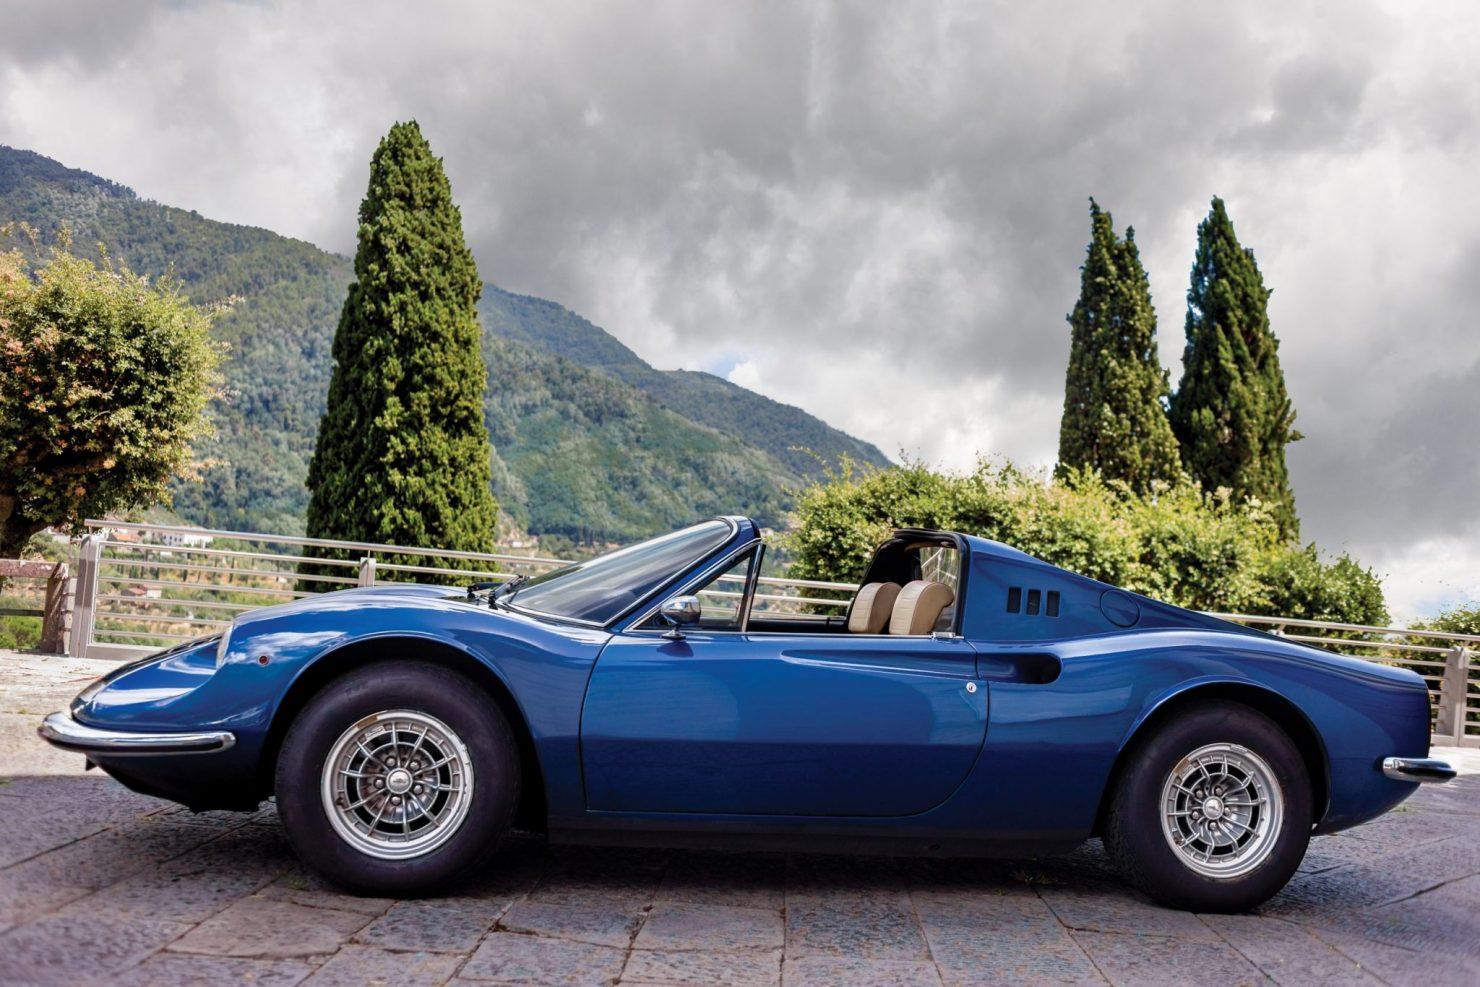 ferrari dino 246 gts car 5 1480x987 - 1973 Ferrari Dino 246 GTS